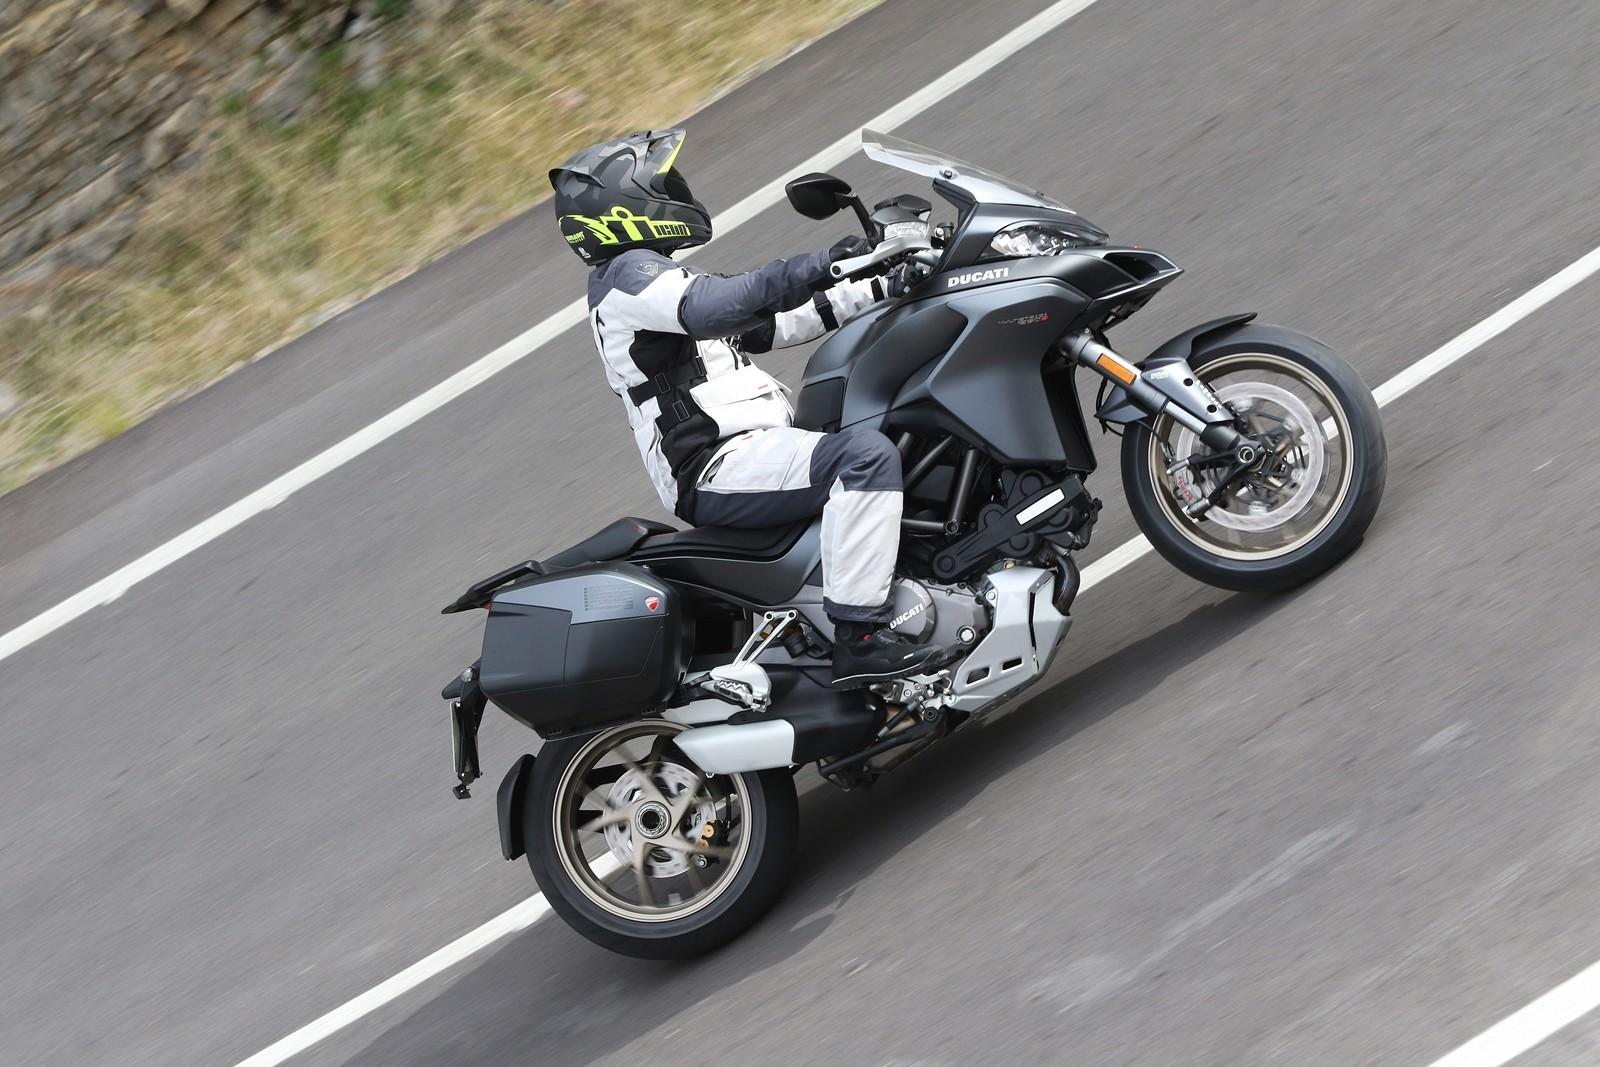 Foto de Ducati Multistrada 1260 2018 prueba (2/21)